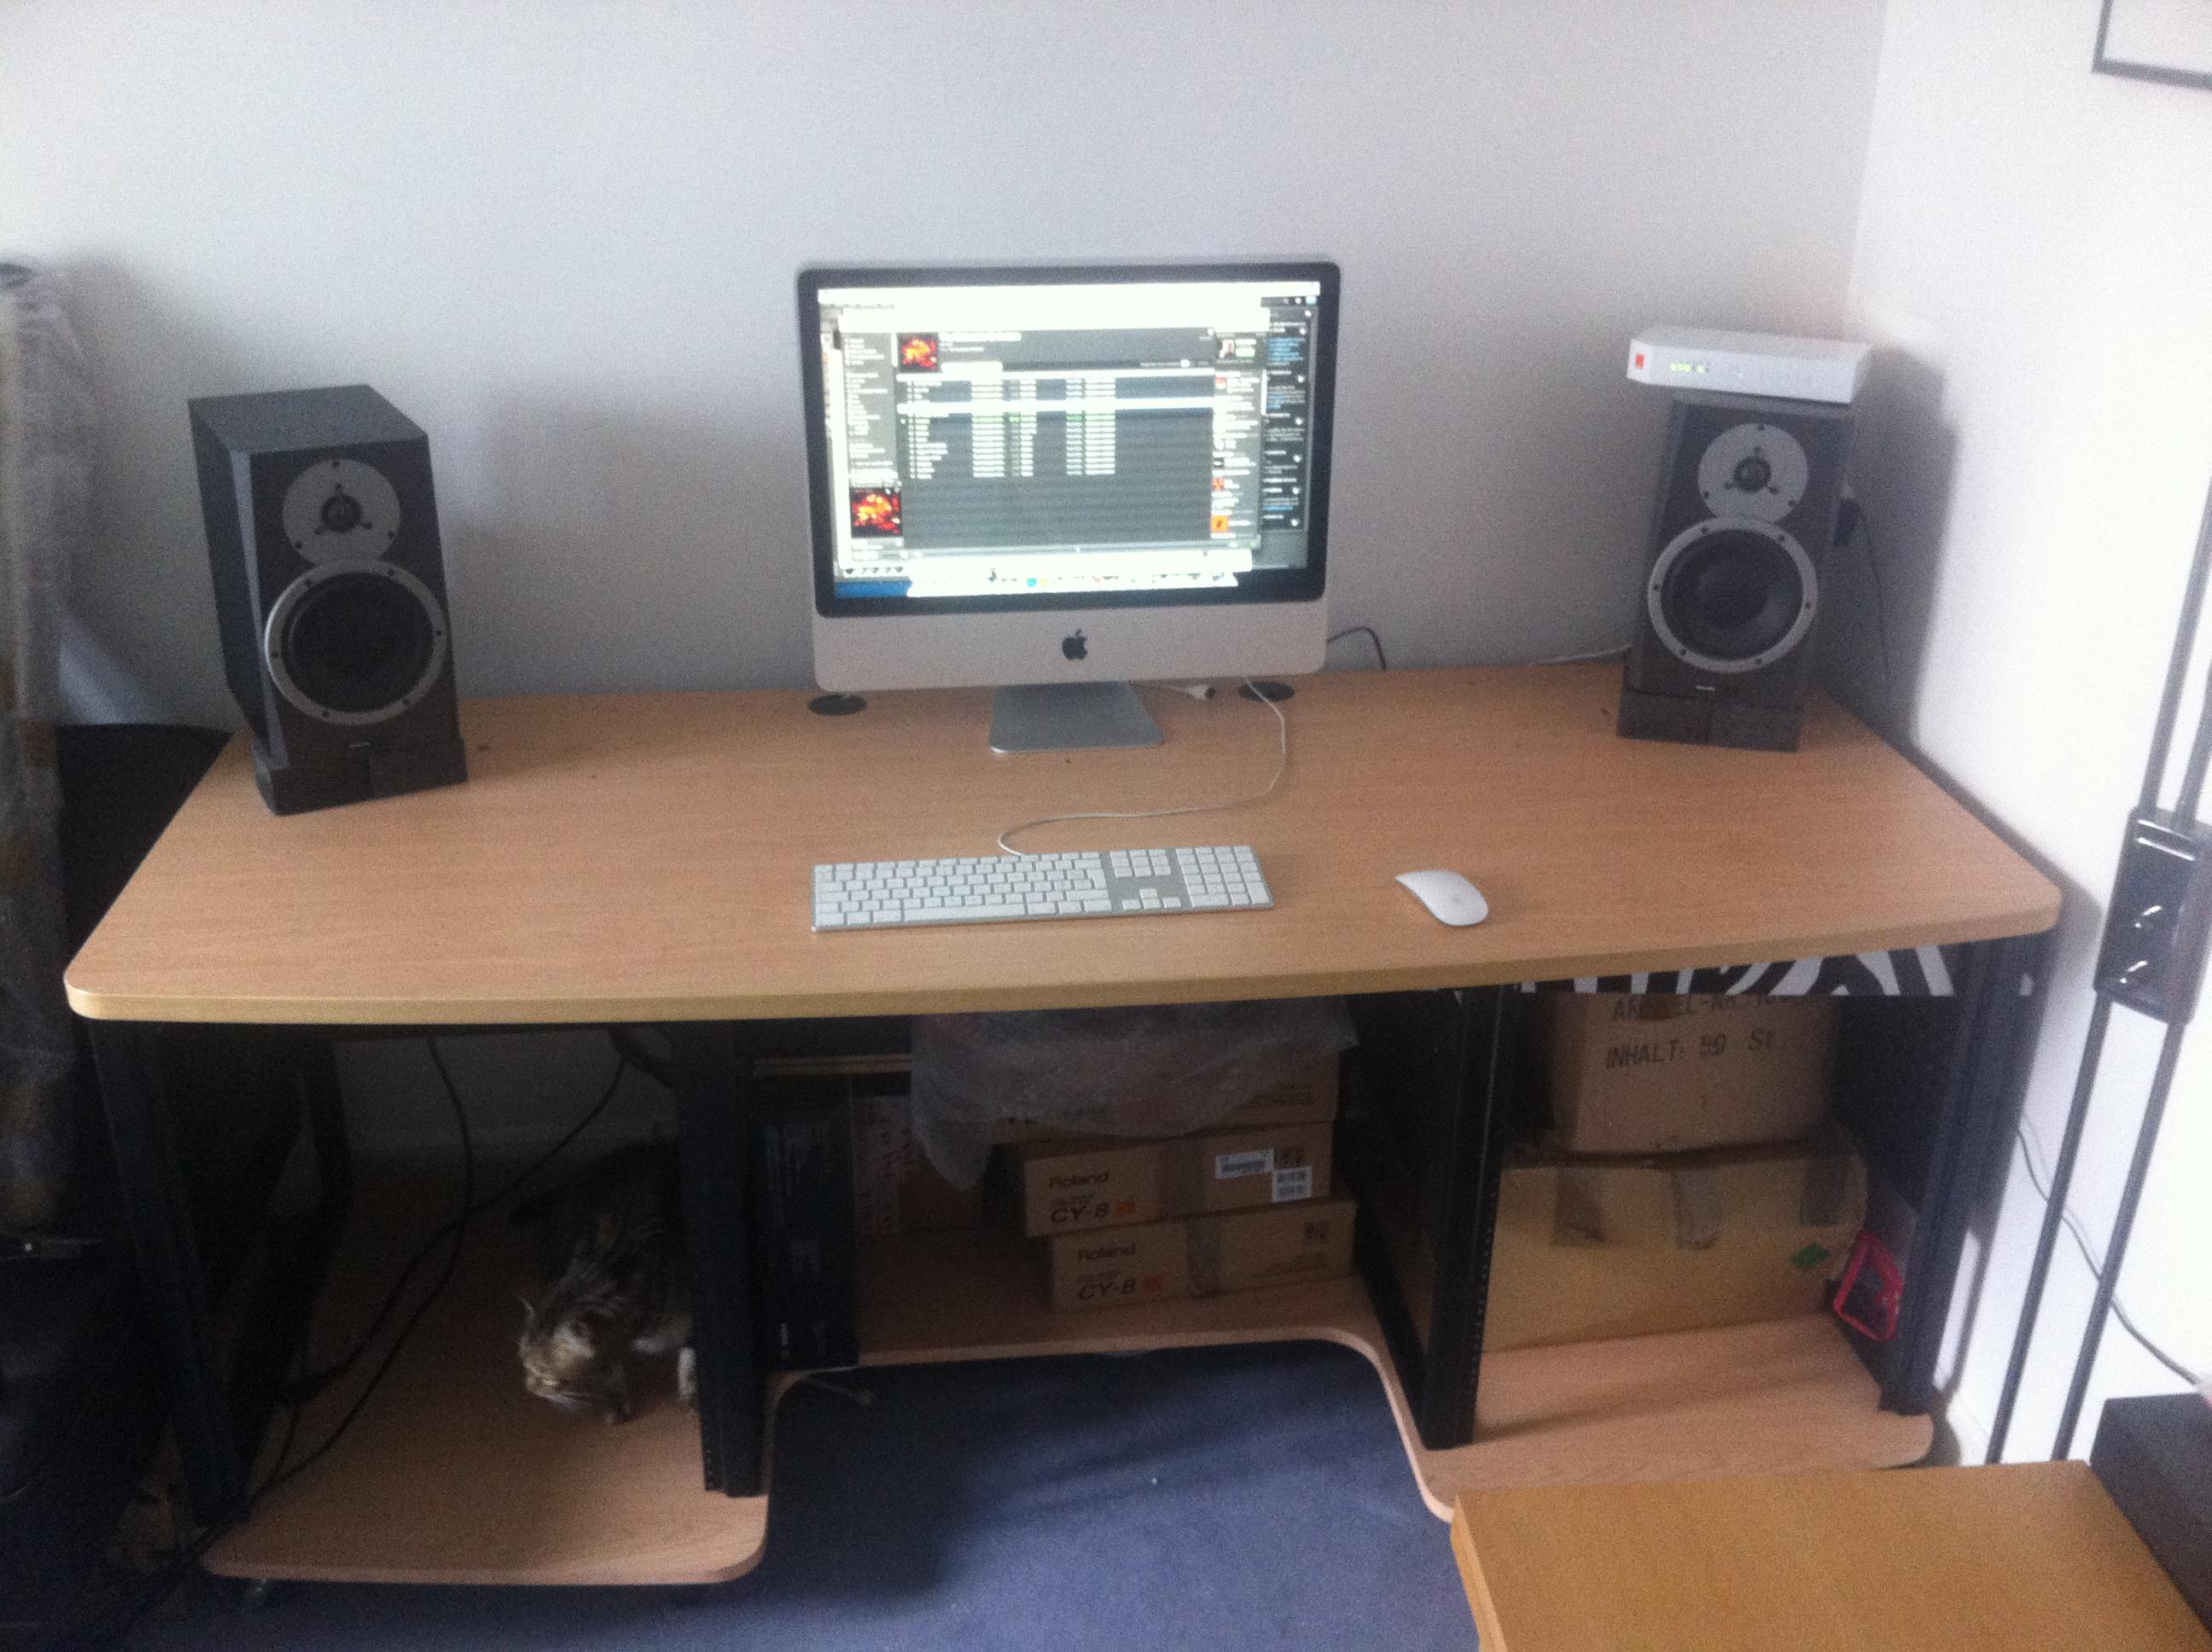 Studio Rta Creation Station Desk Photo Studio Rta Creation